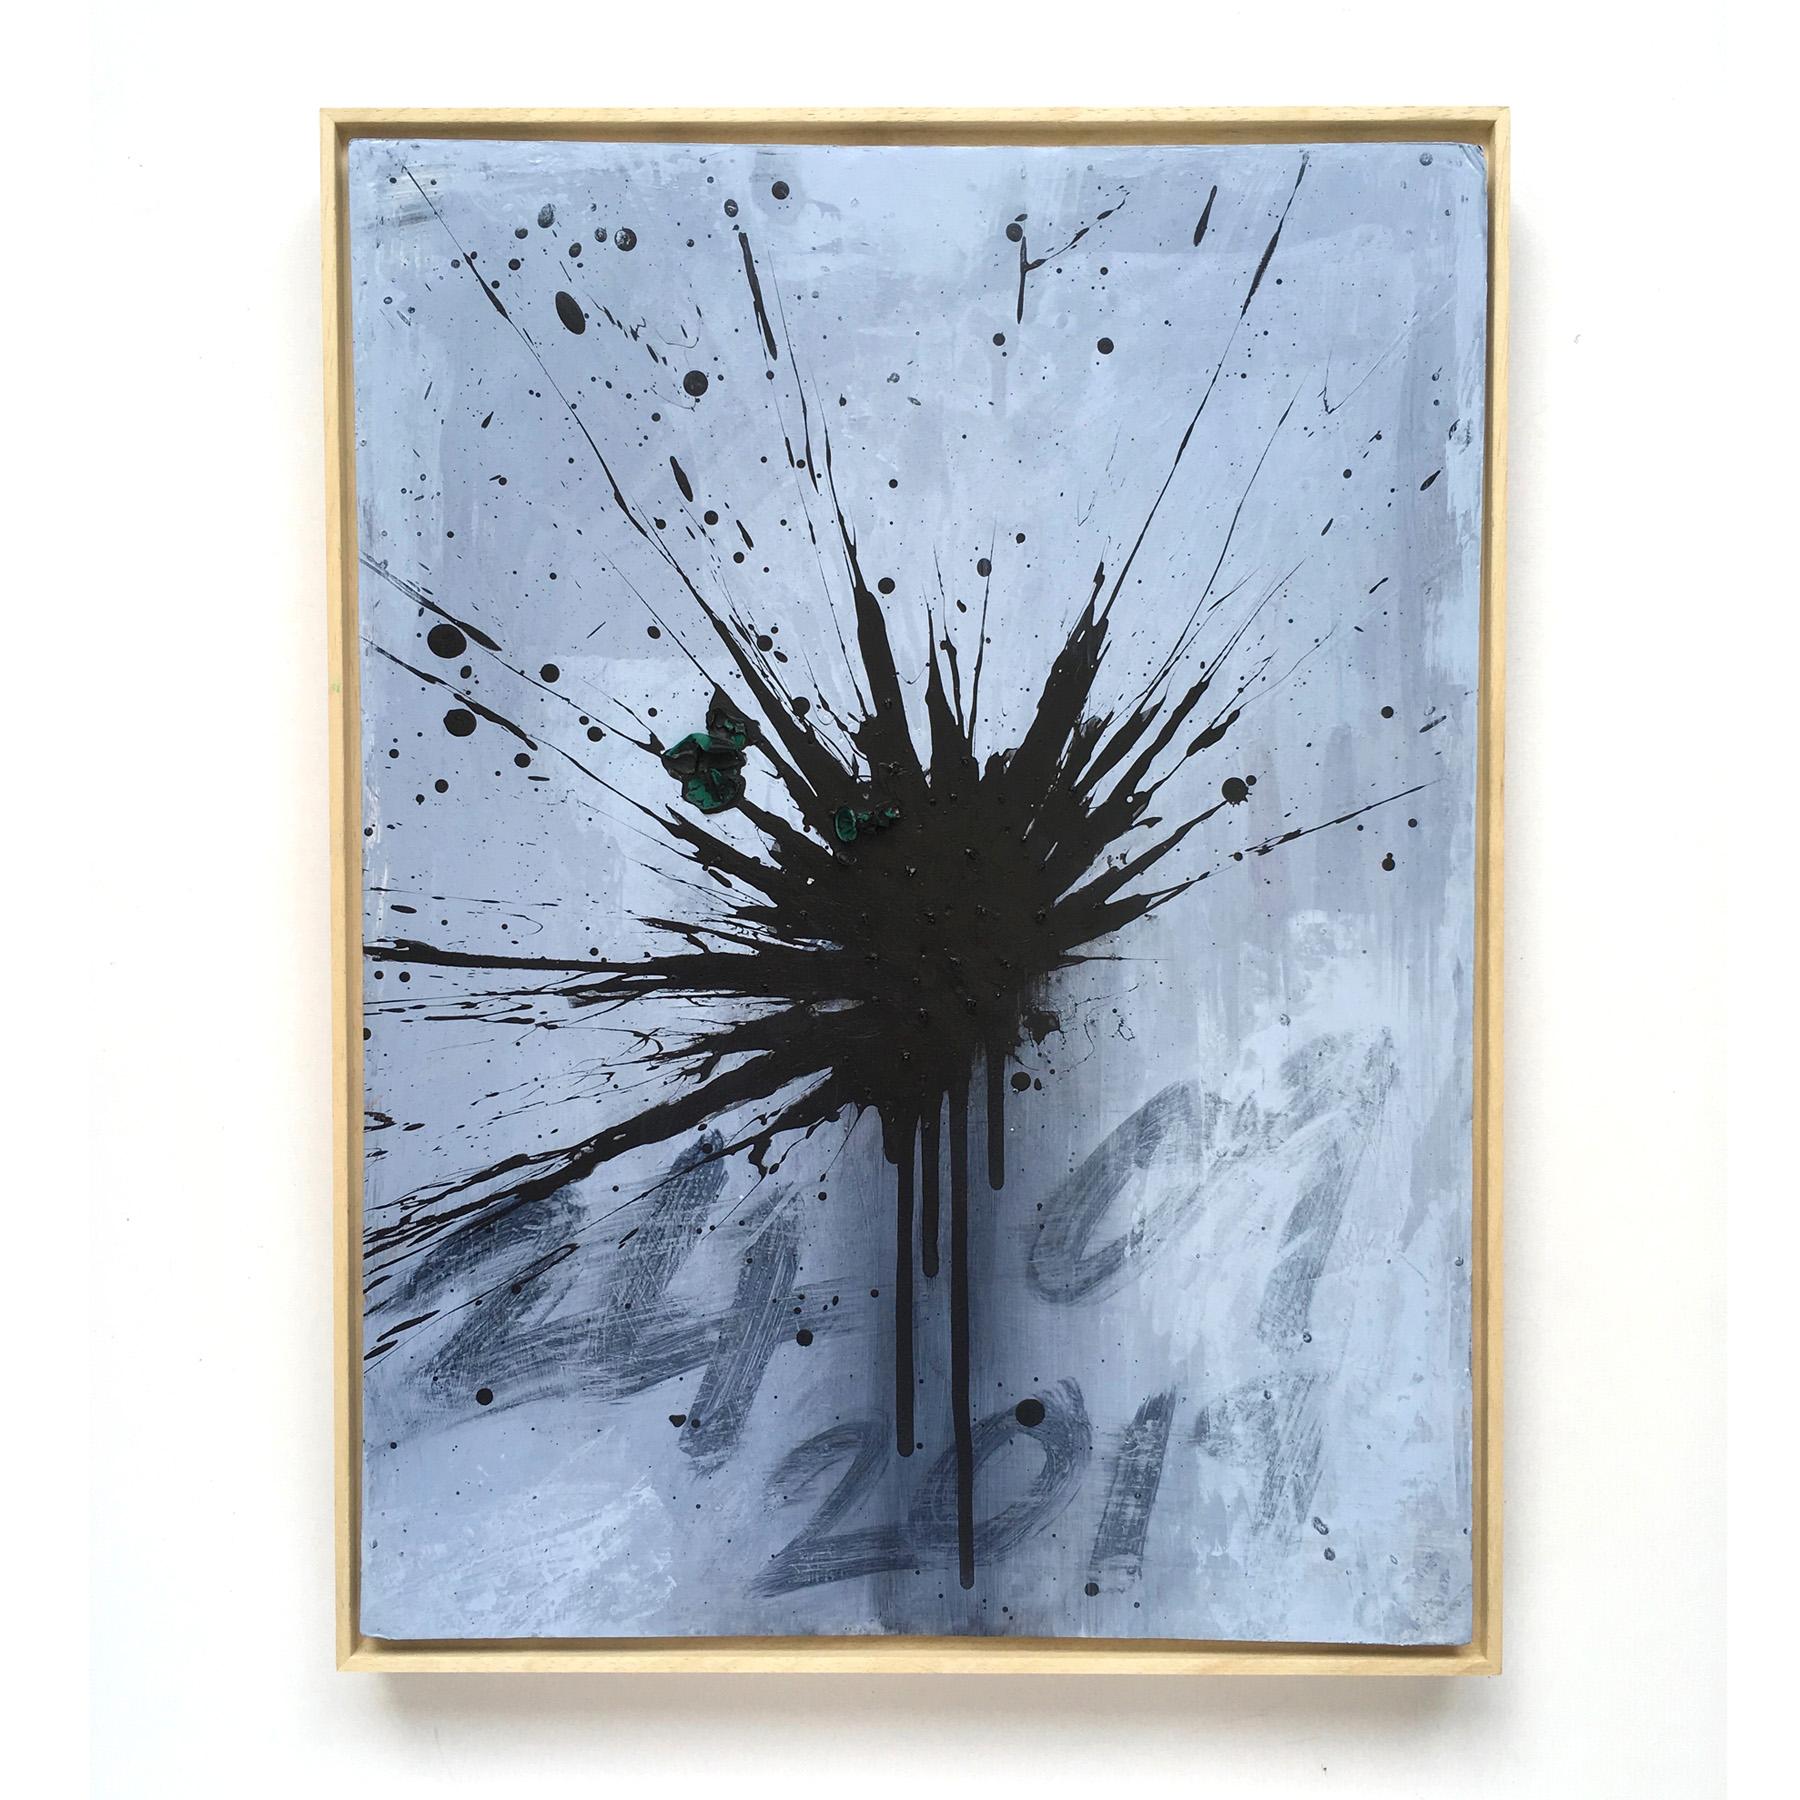 Black Firework Painting 24.09.19